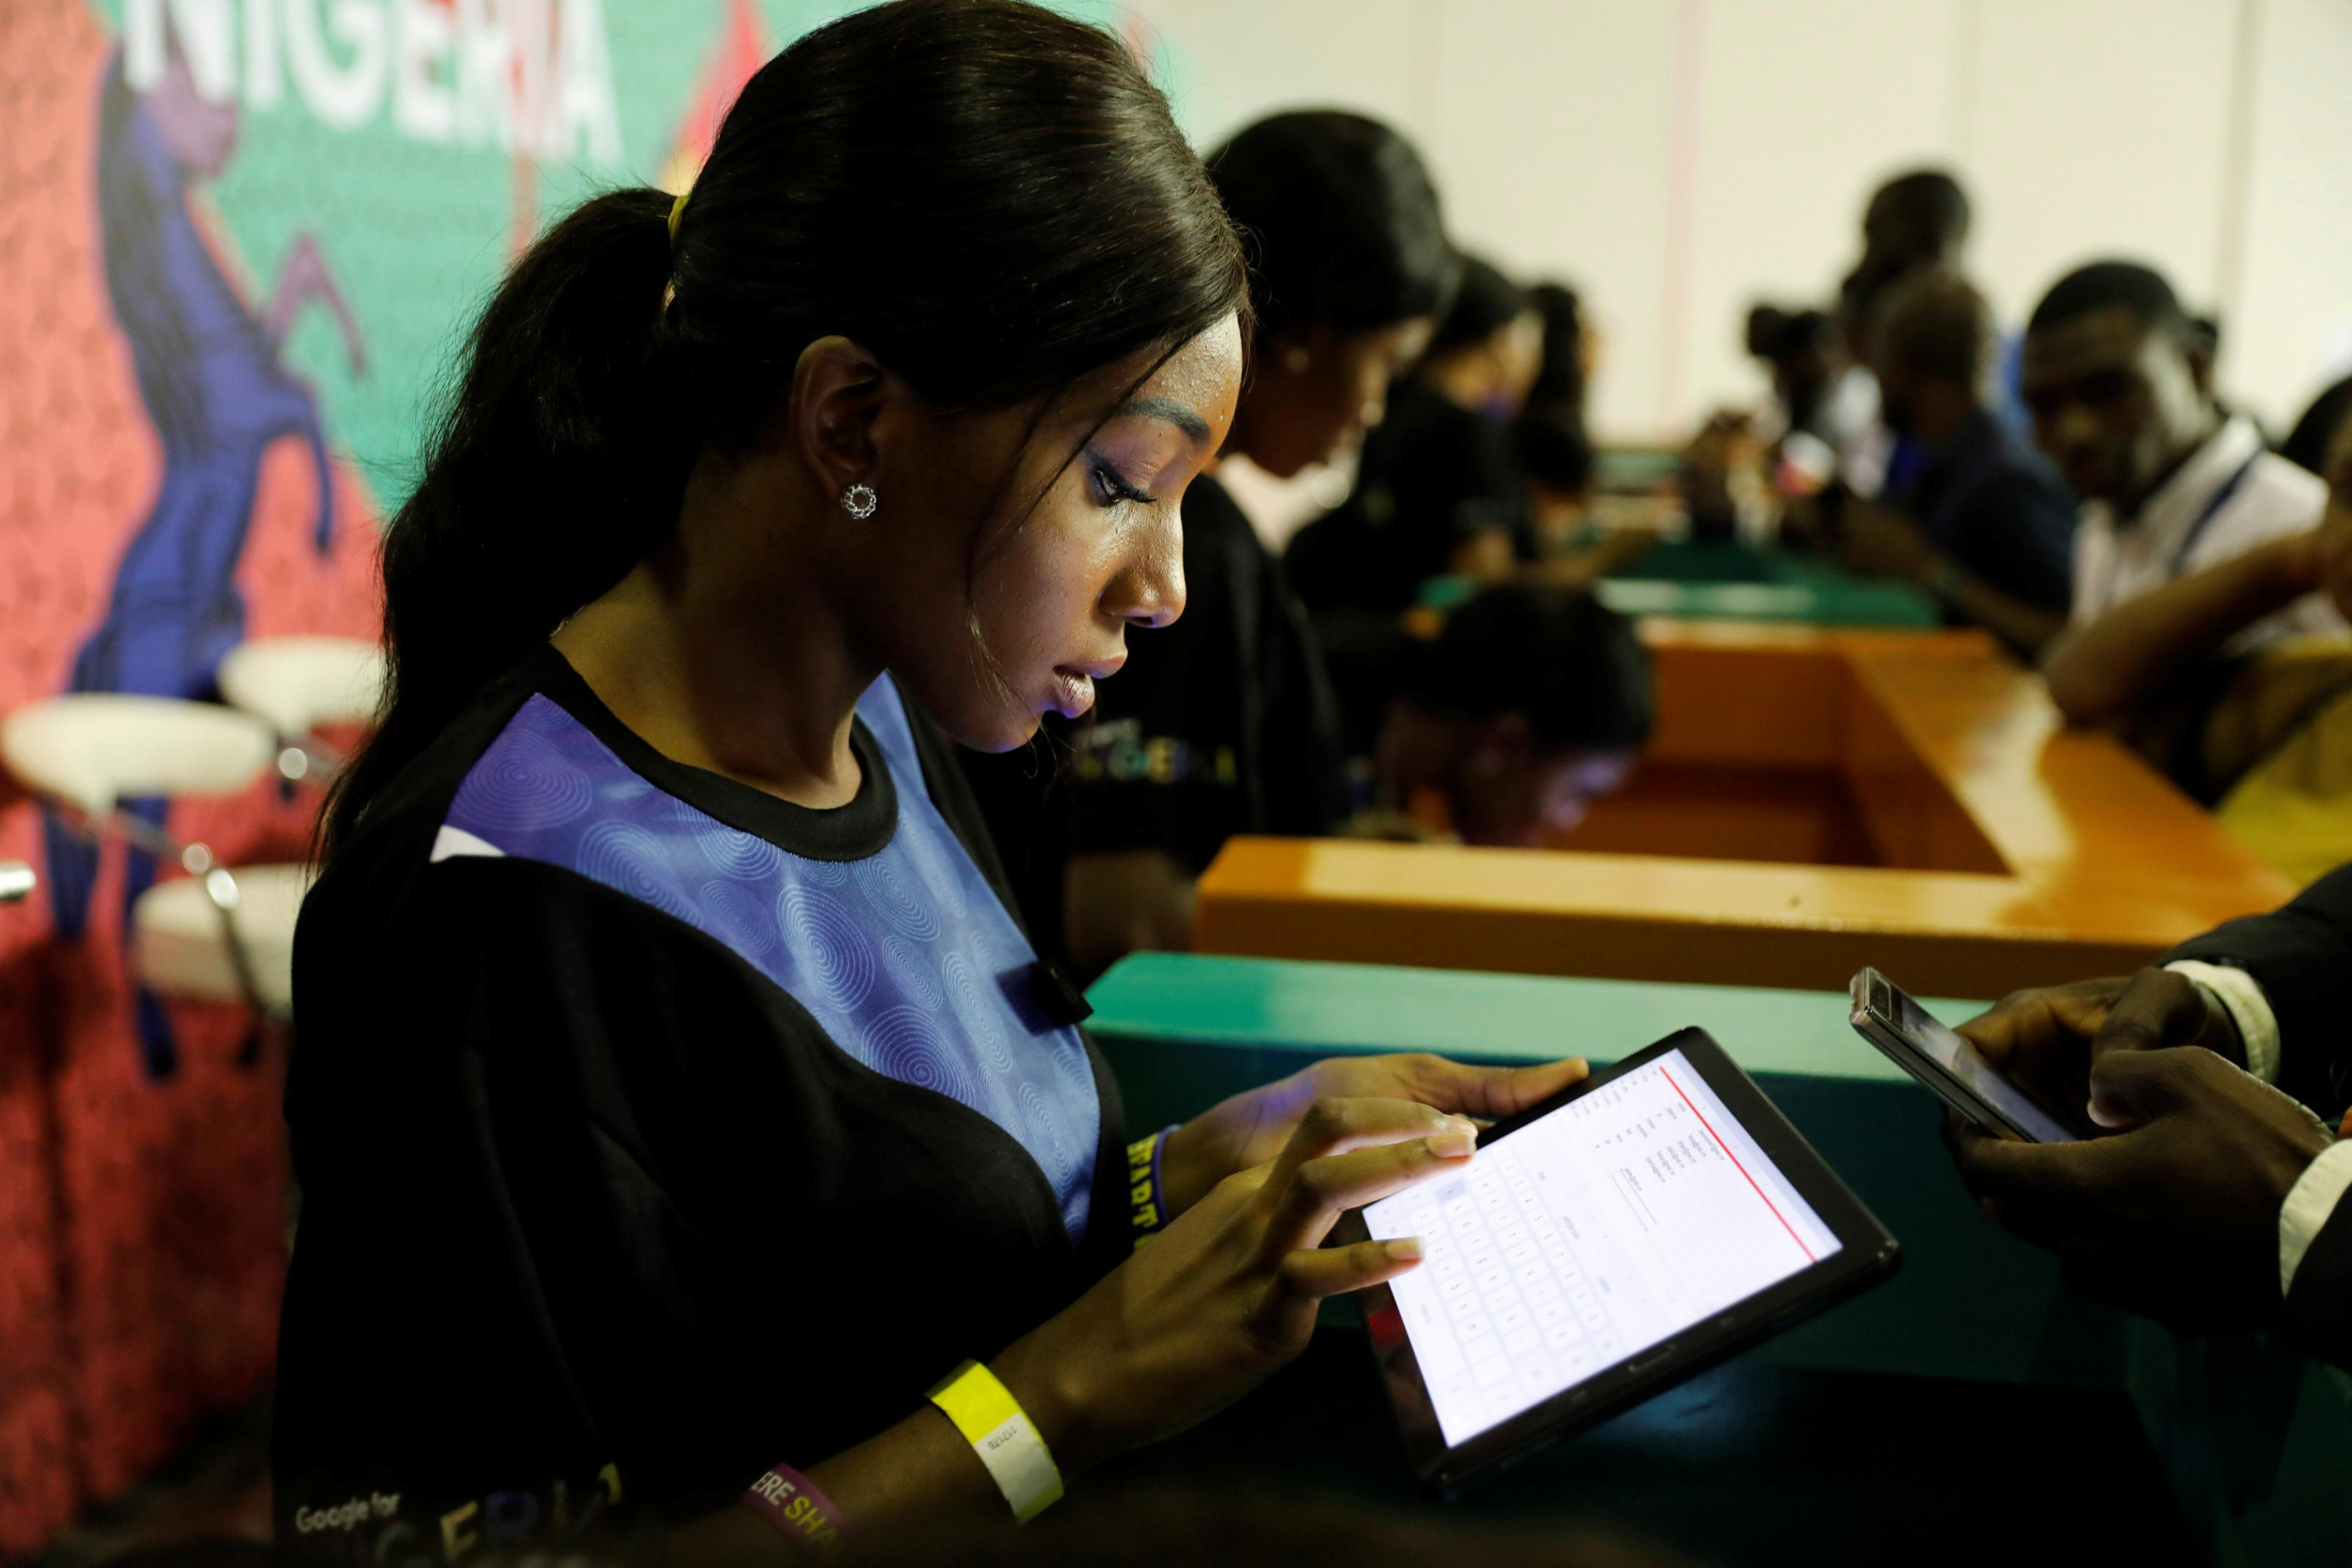 Google, Facebook building undersea internet cable for Africa